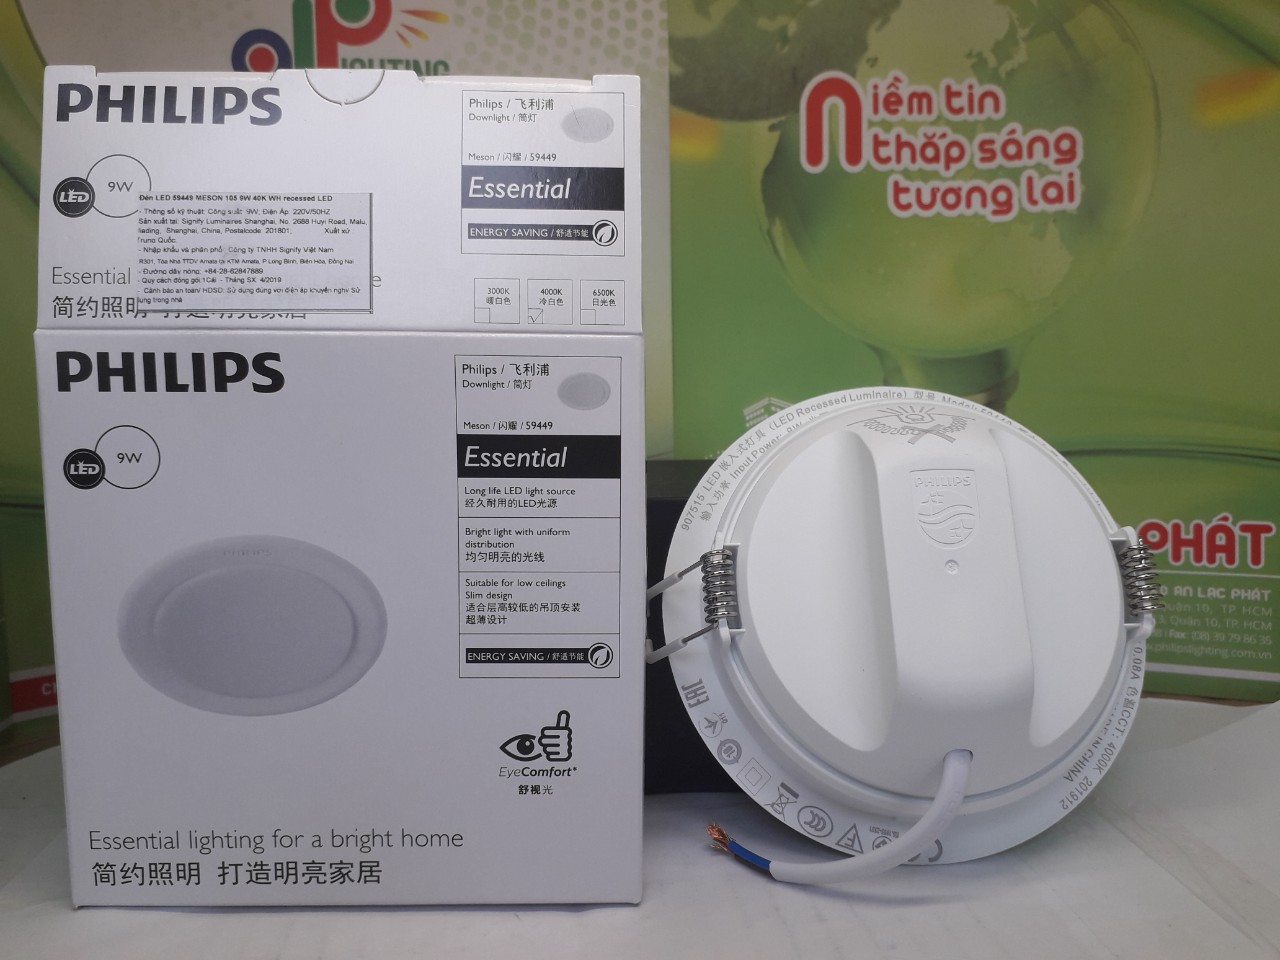 Mặt sau đèn Led Philips âm trần Menson 59449